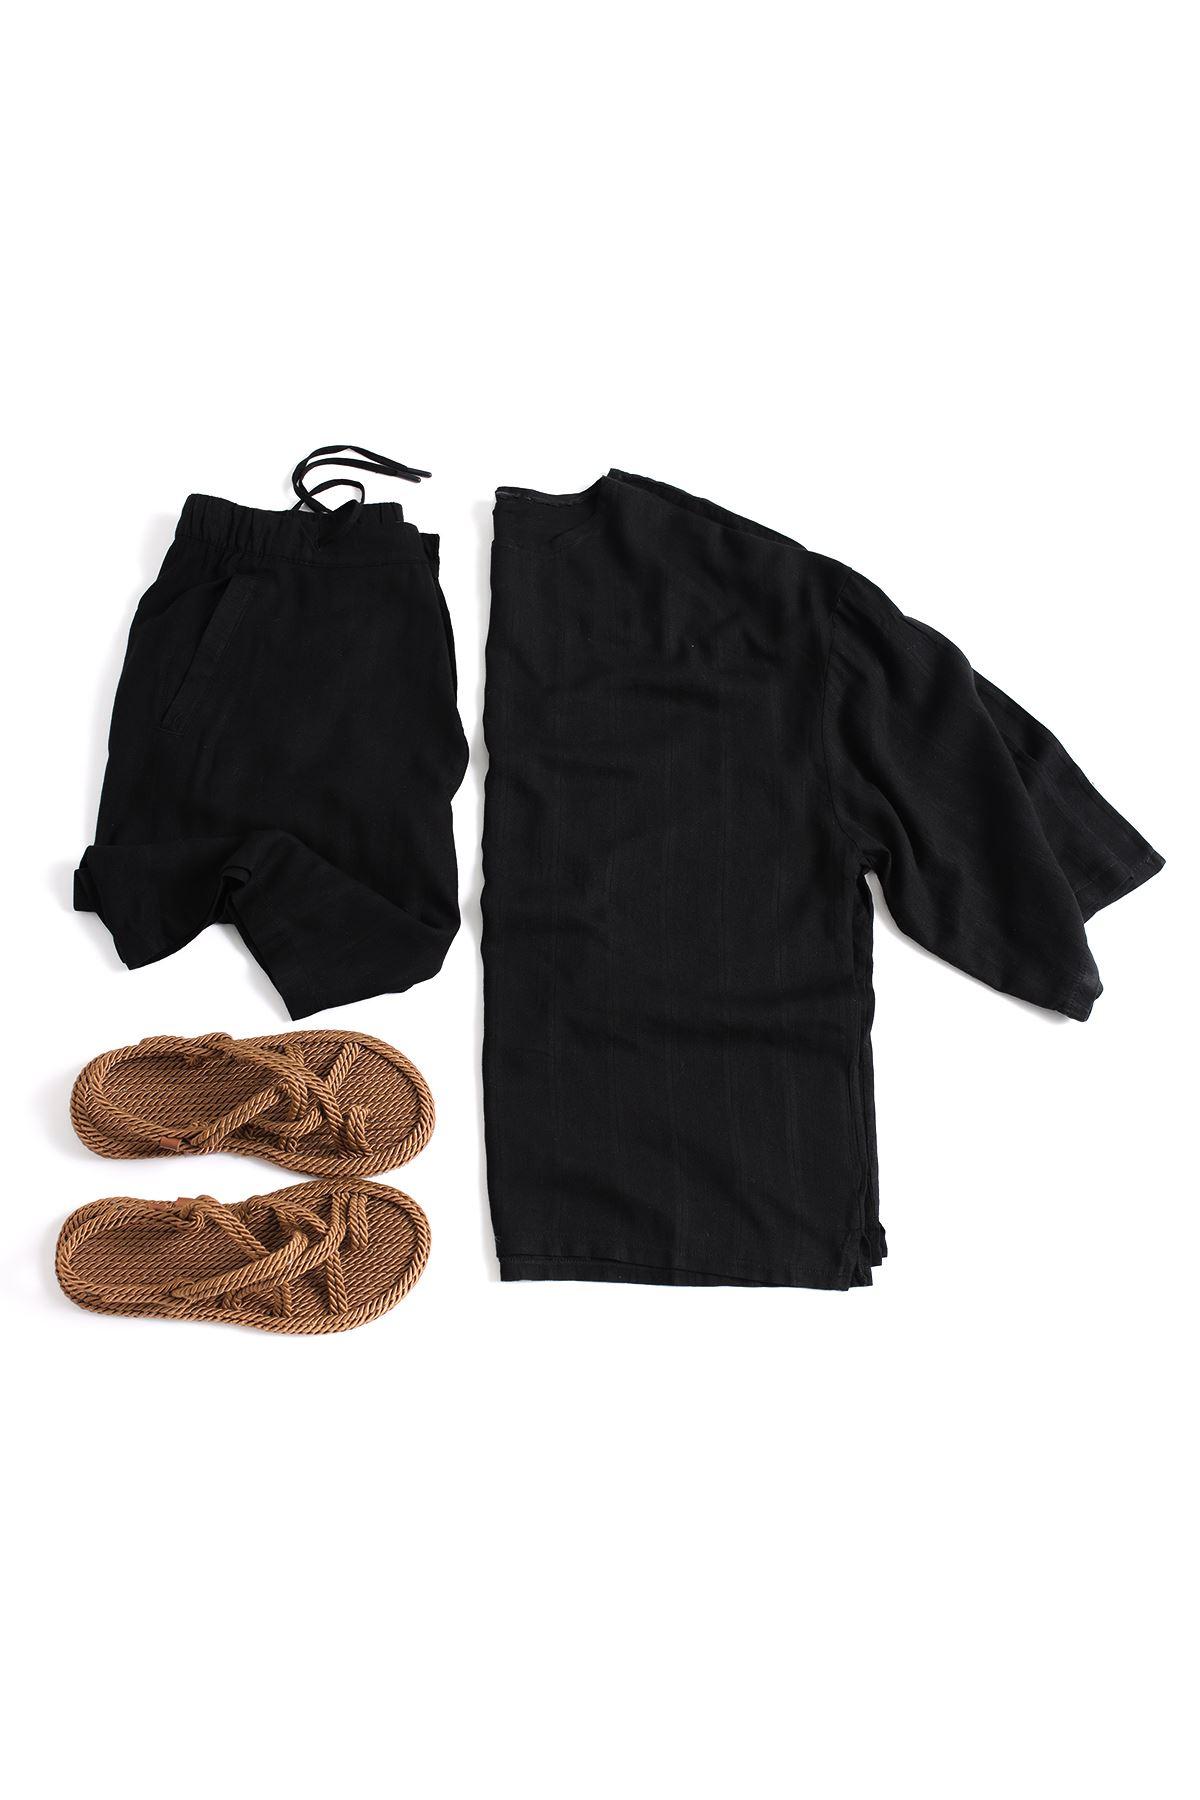 Siyah Viskon Keten Kombin